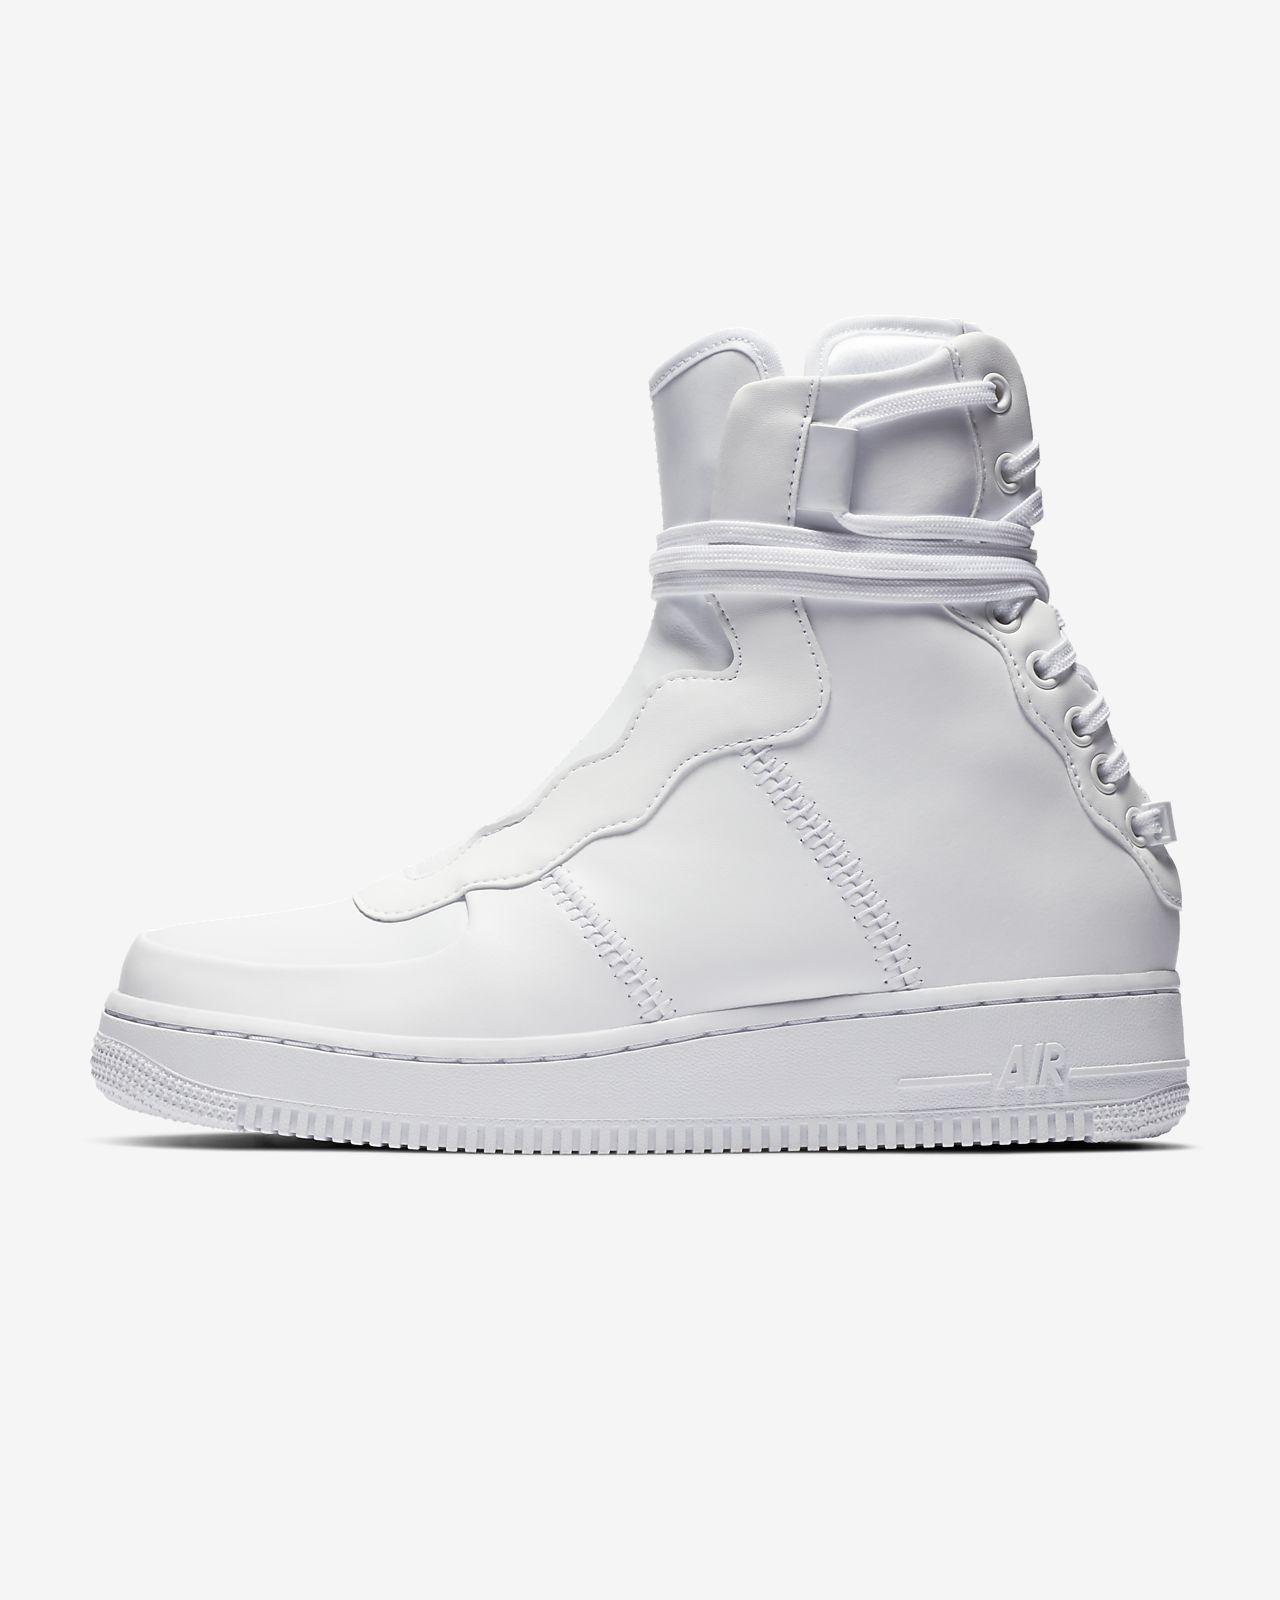 a1a5d053ab75c Nike AF1 Rebel XX Women s Shoe. Nike.com